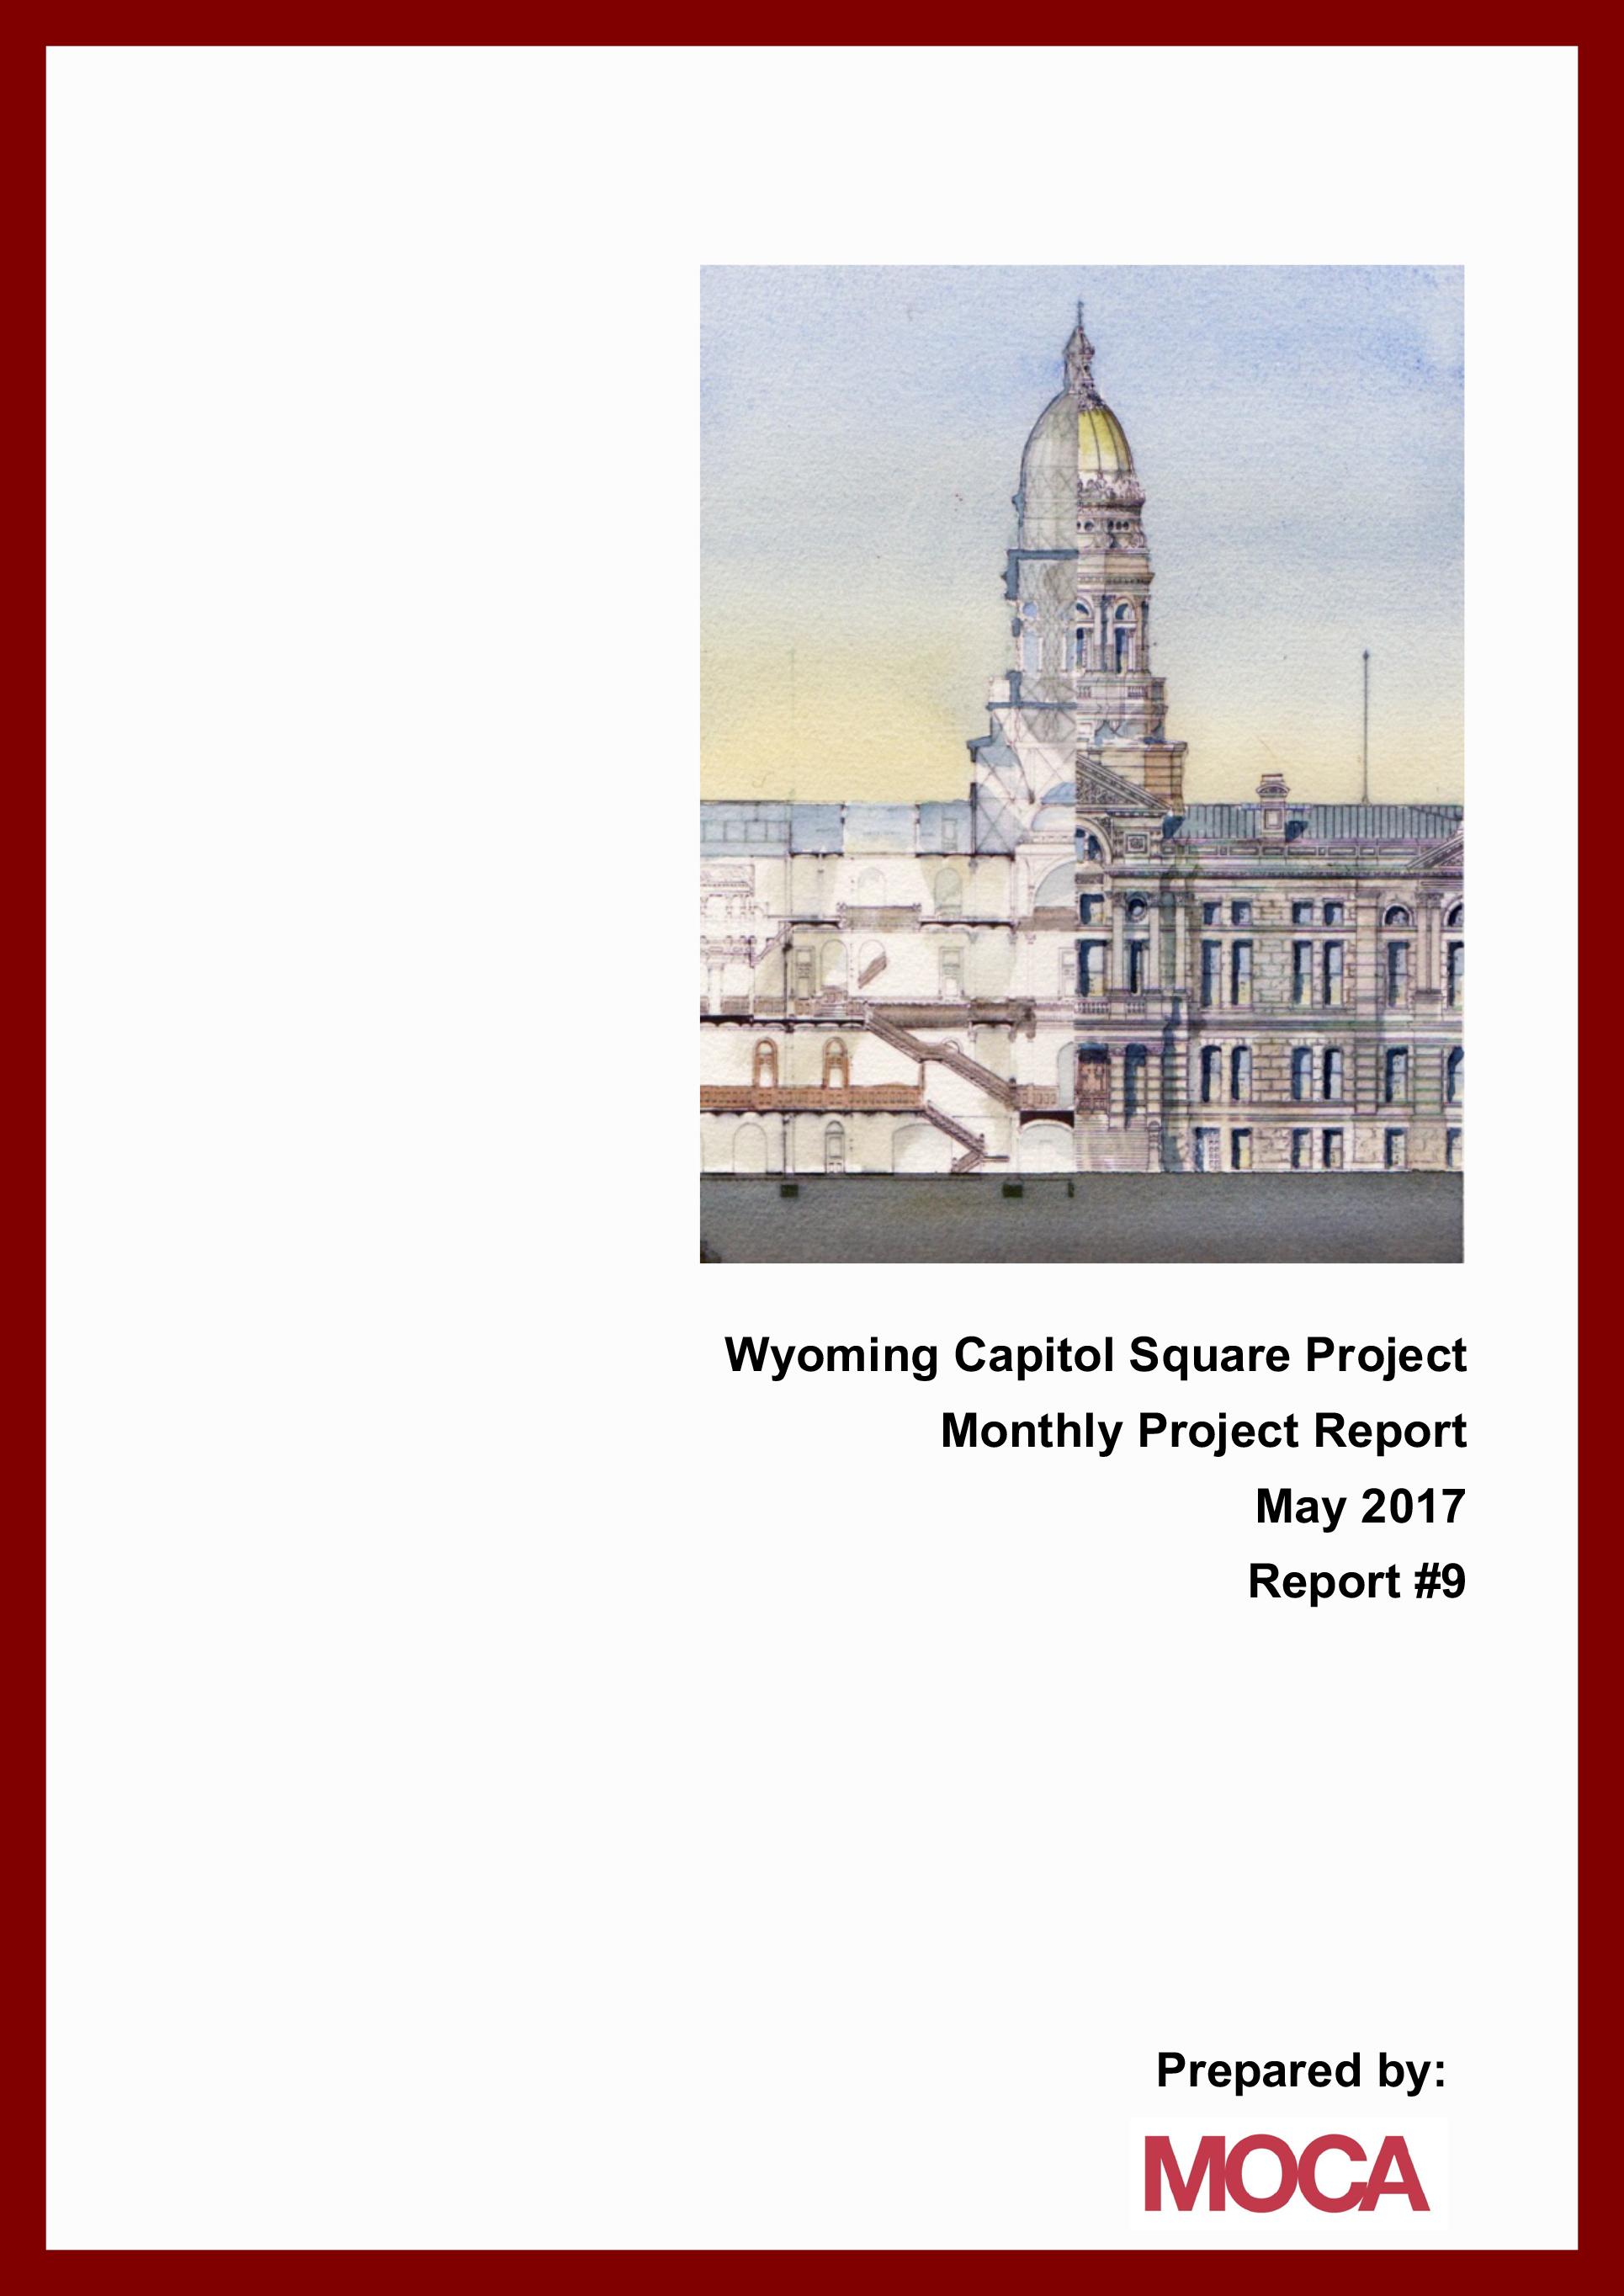 2017-0602-WyomingCapitolMonthlyReport-Final-9.jpg